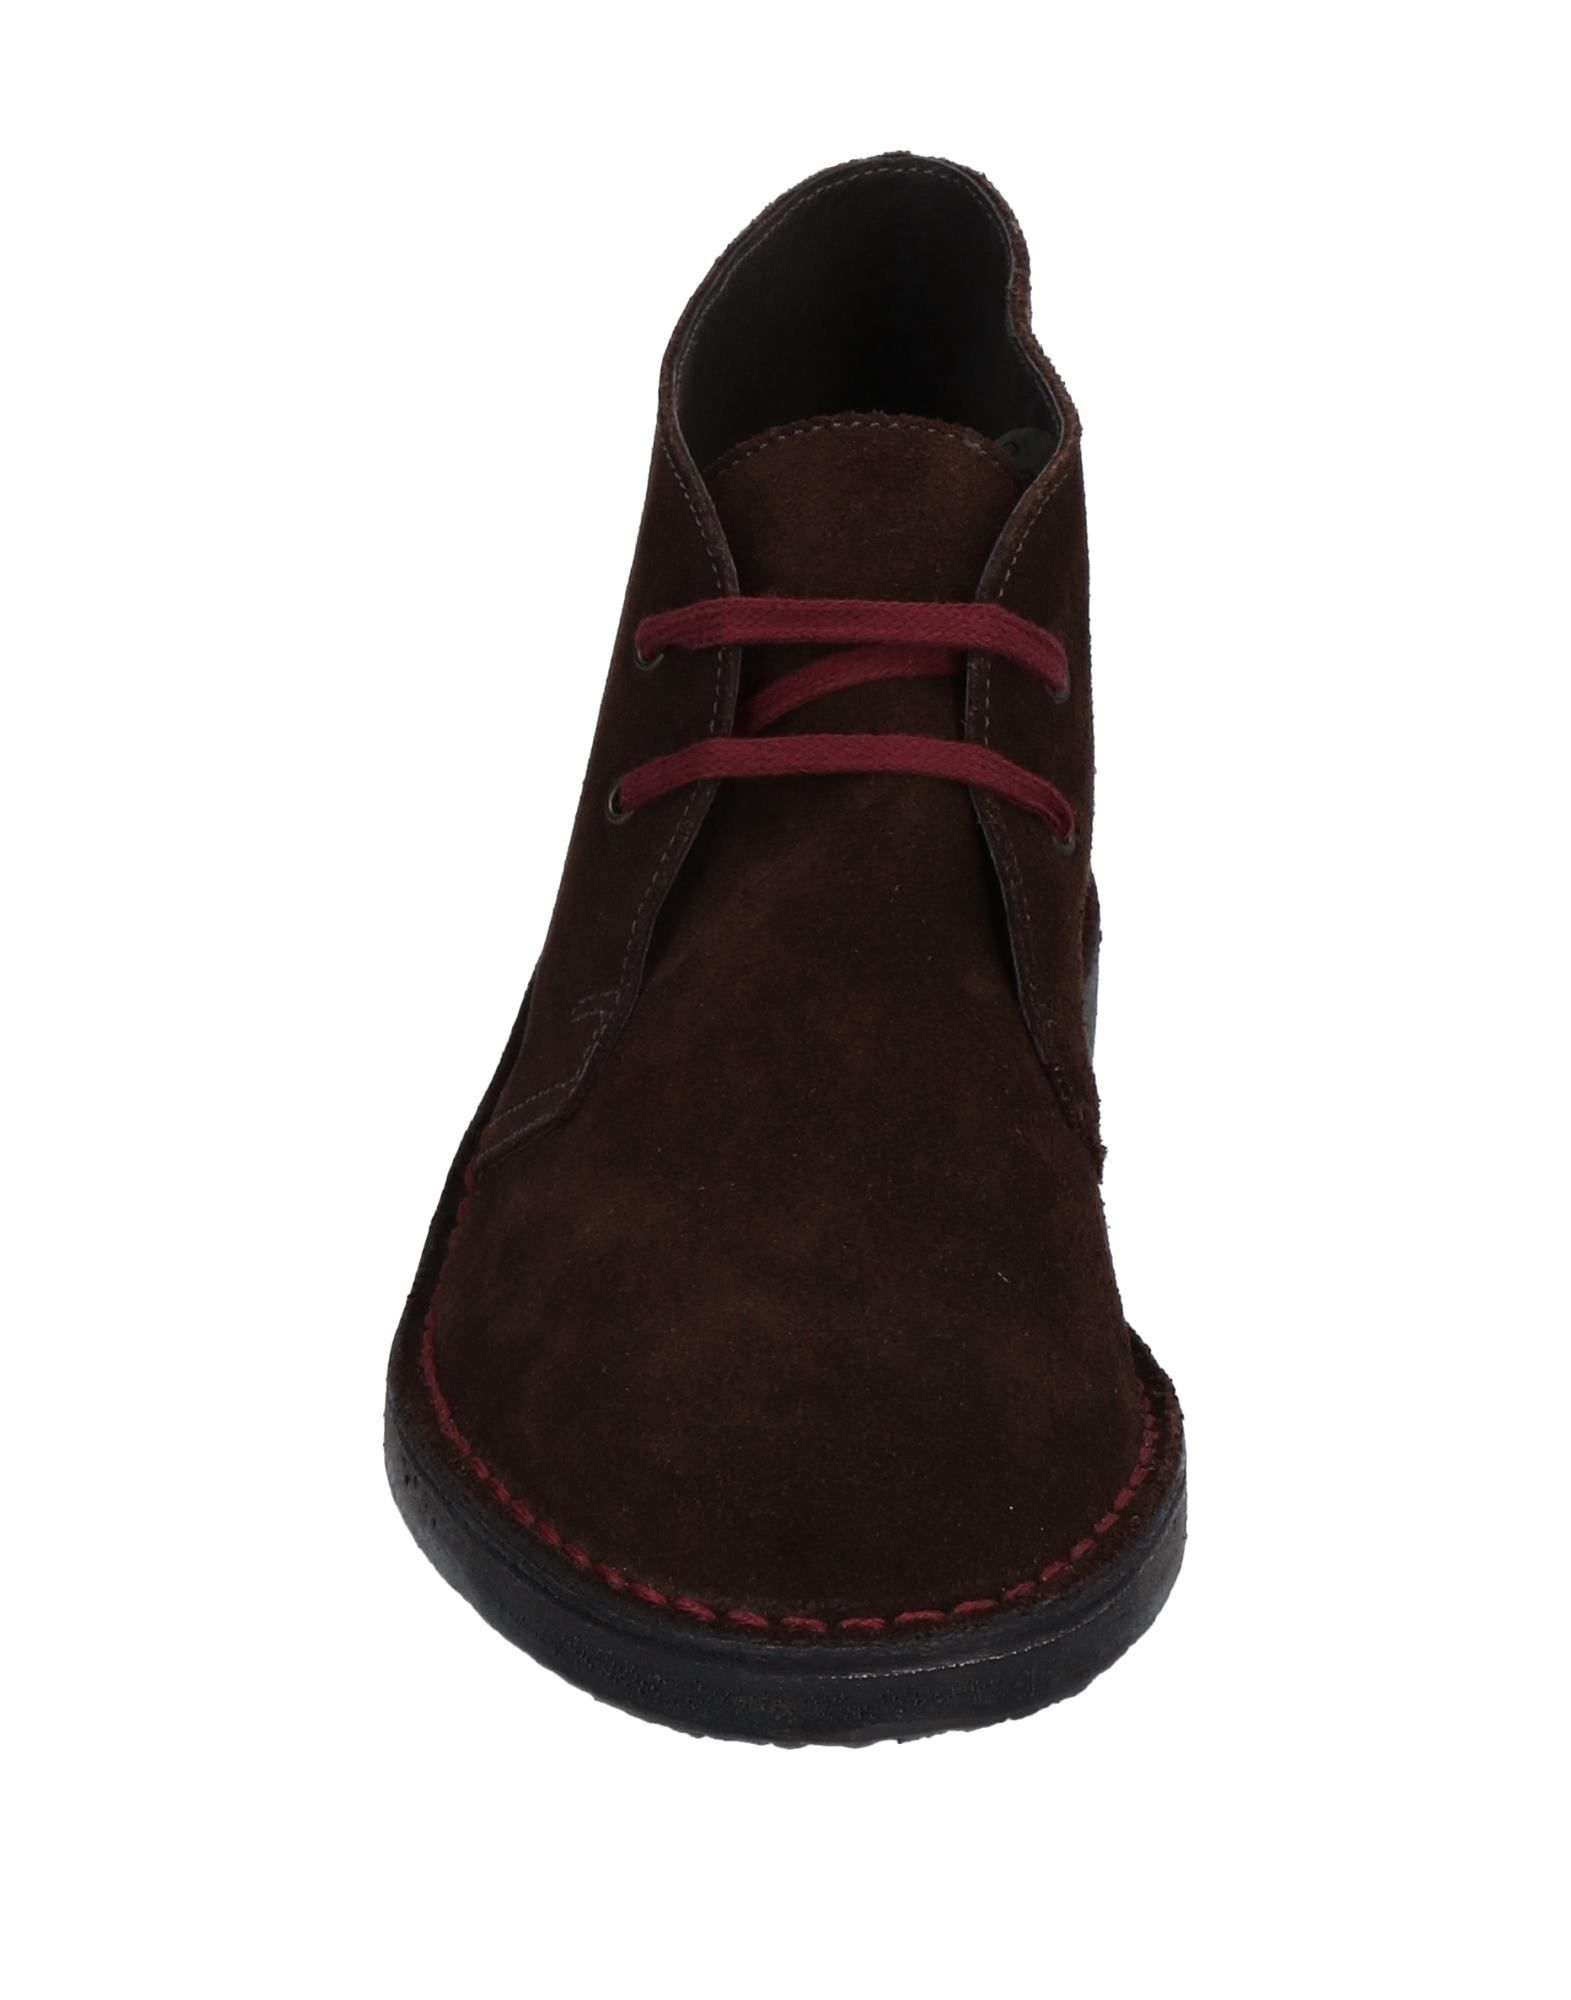 Anderson Boots - Men Anderson Boots online on  Australia Australia Australia - 11240322PH 1a7dc8